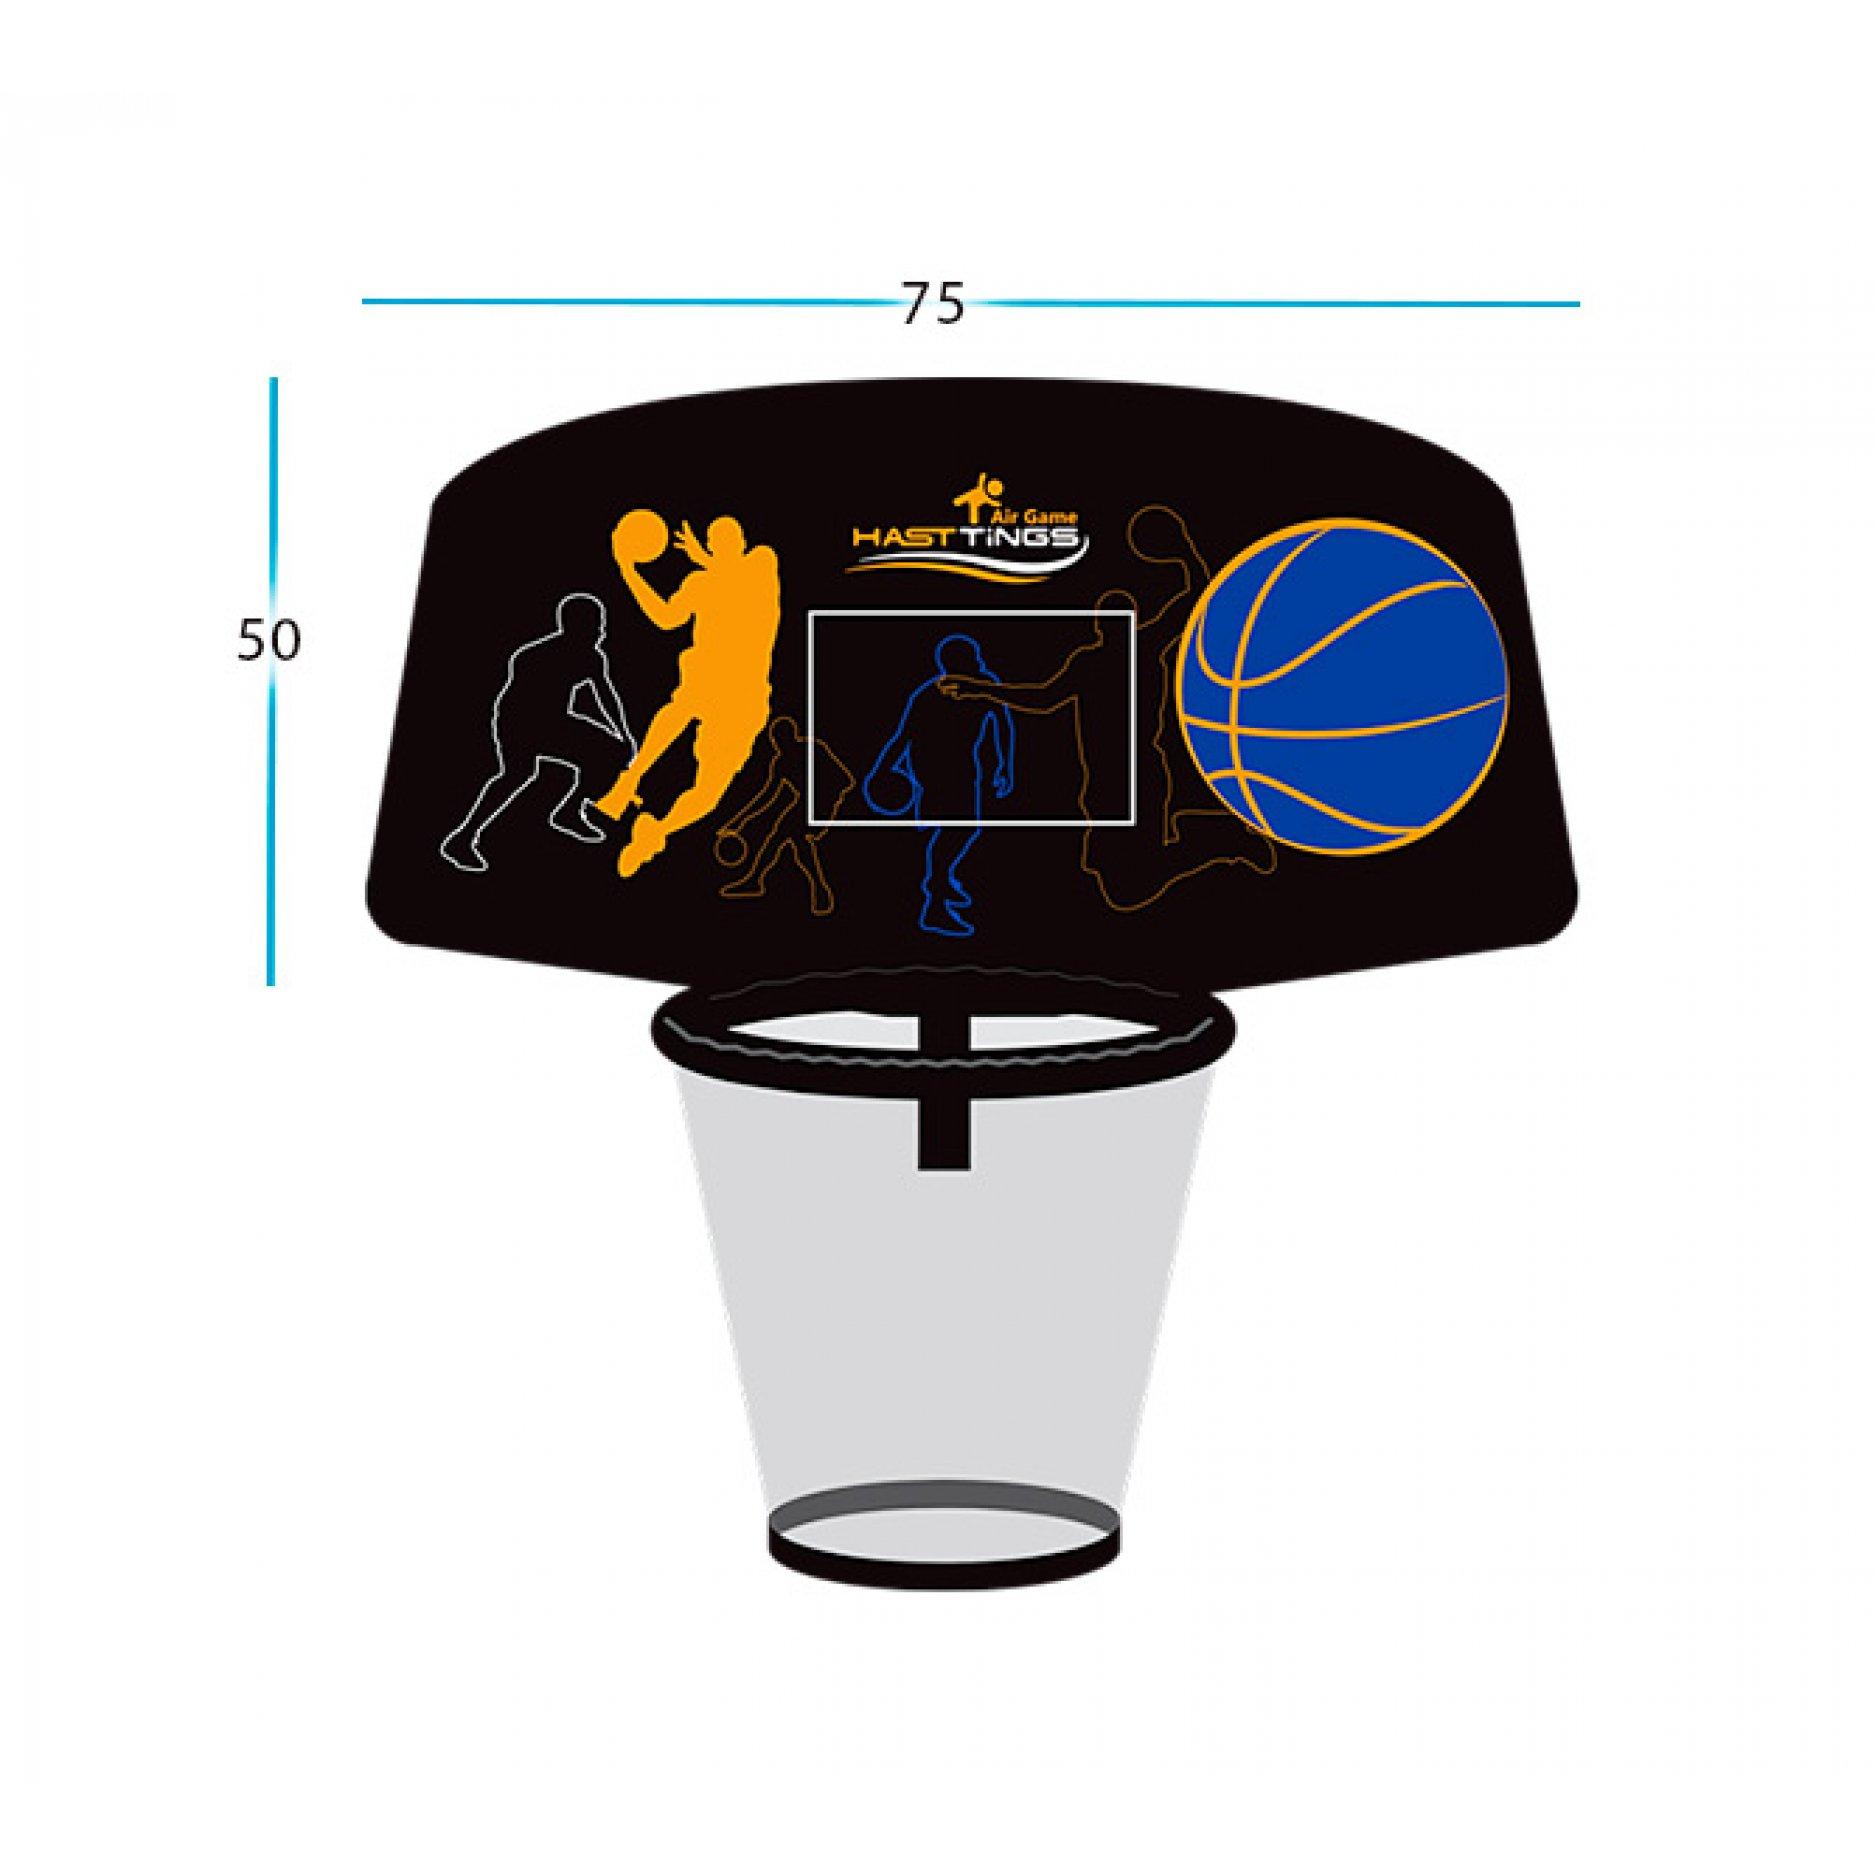 Сет для баскетбола Hasttings